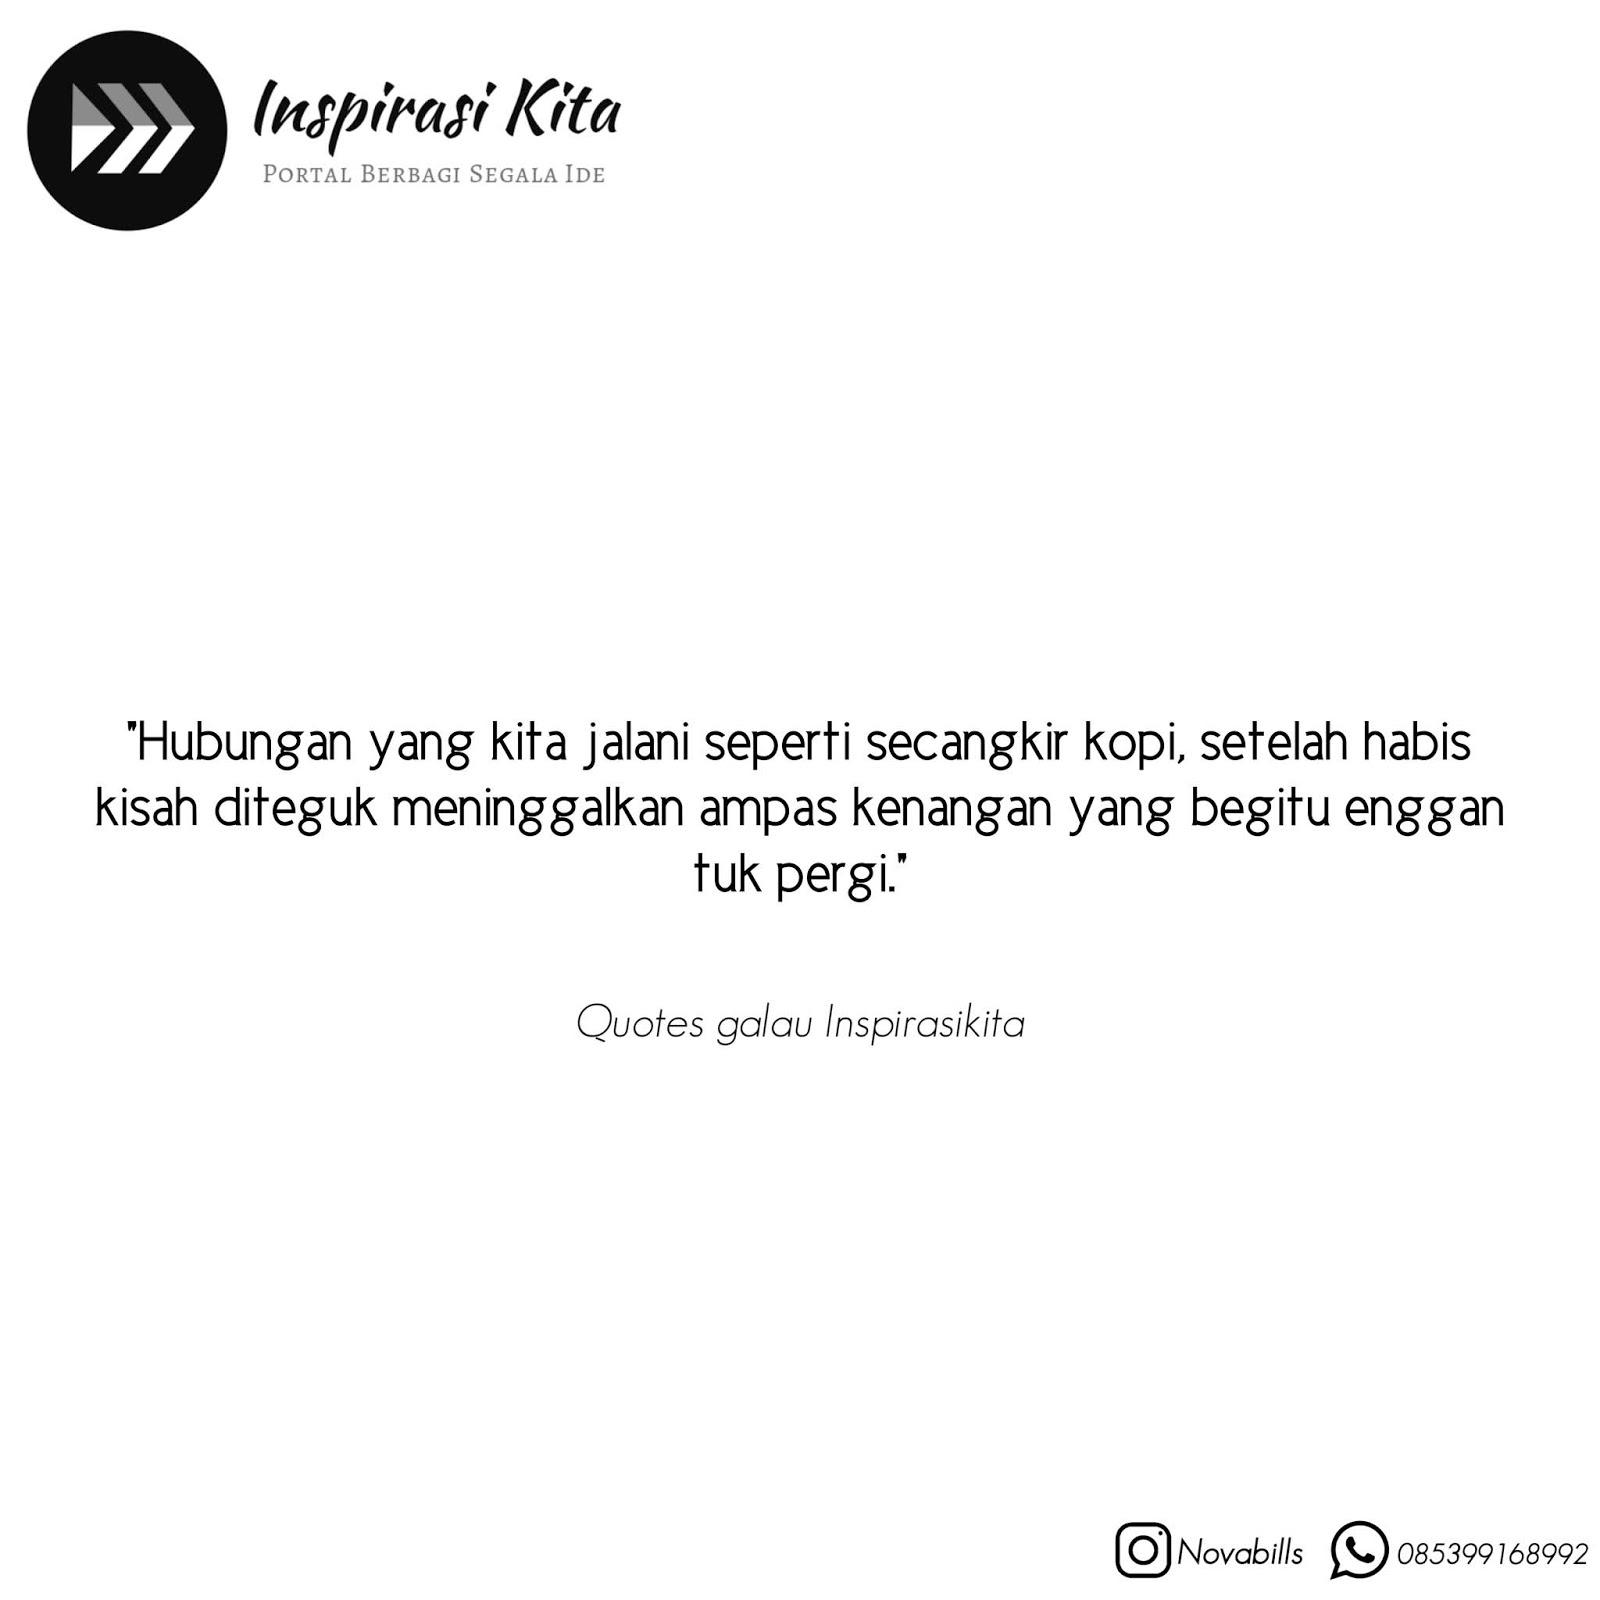 quotes galau inspirasi kita